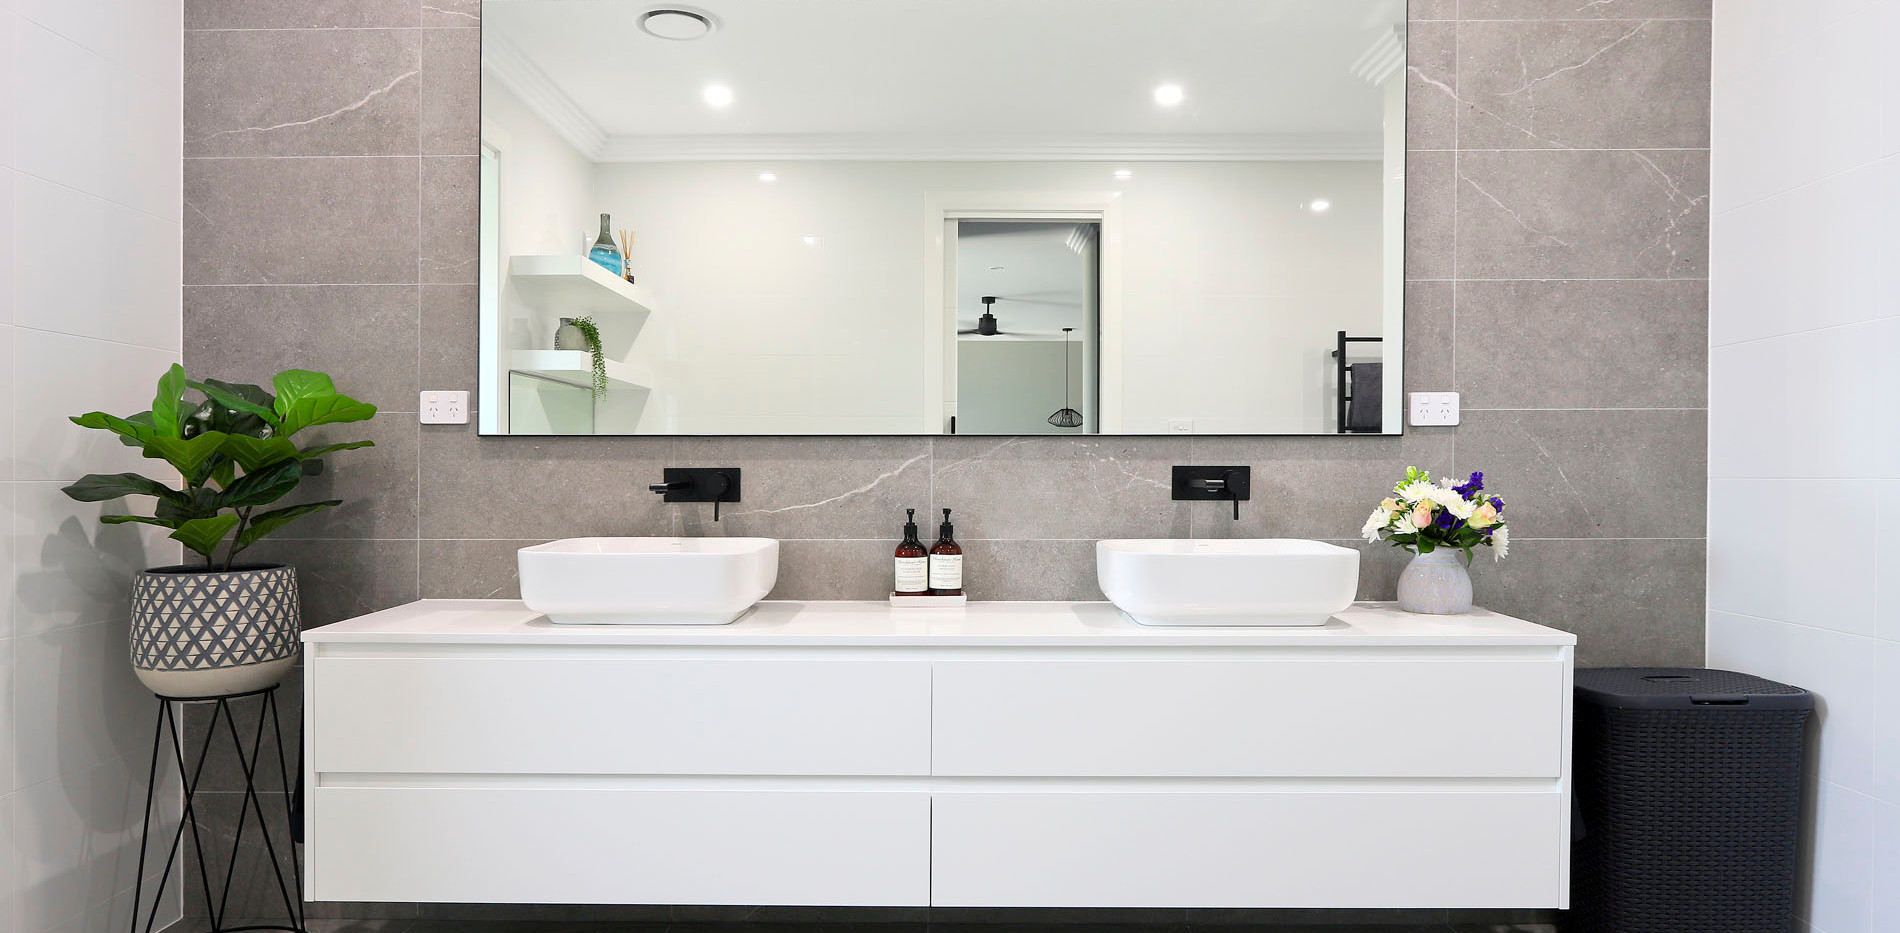 Hawkesbury bathrooms and Kitchens (45)